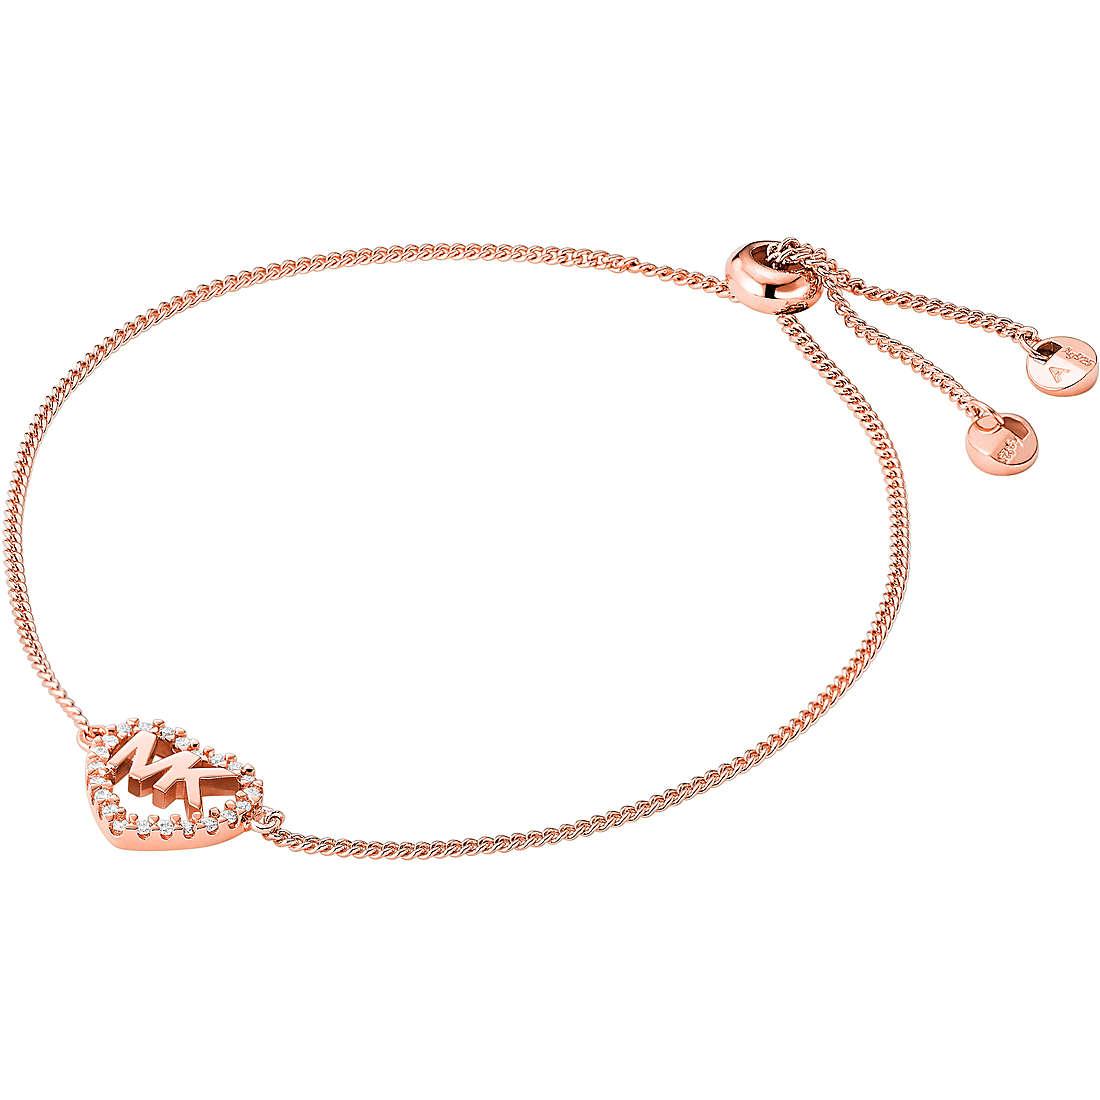 bracelet woman jewellery Michael Kors Kors Mk MKC1242AN791